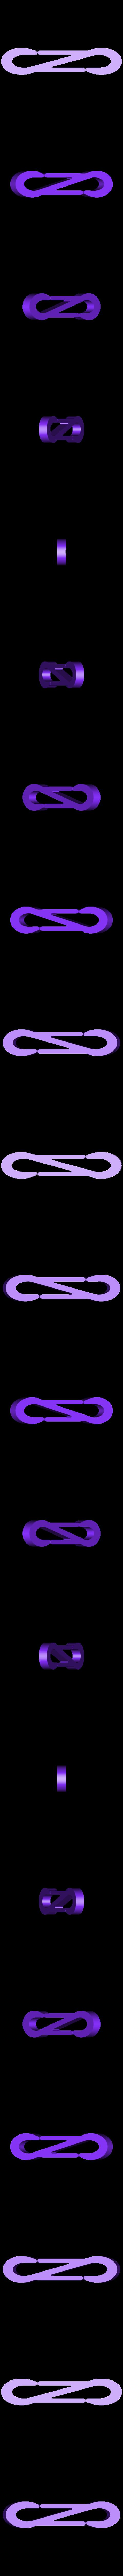 Organizer_Carabiner.stl Download free STL file Key Organizer Carabiner • Design to 3D print, MuSSy